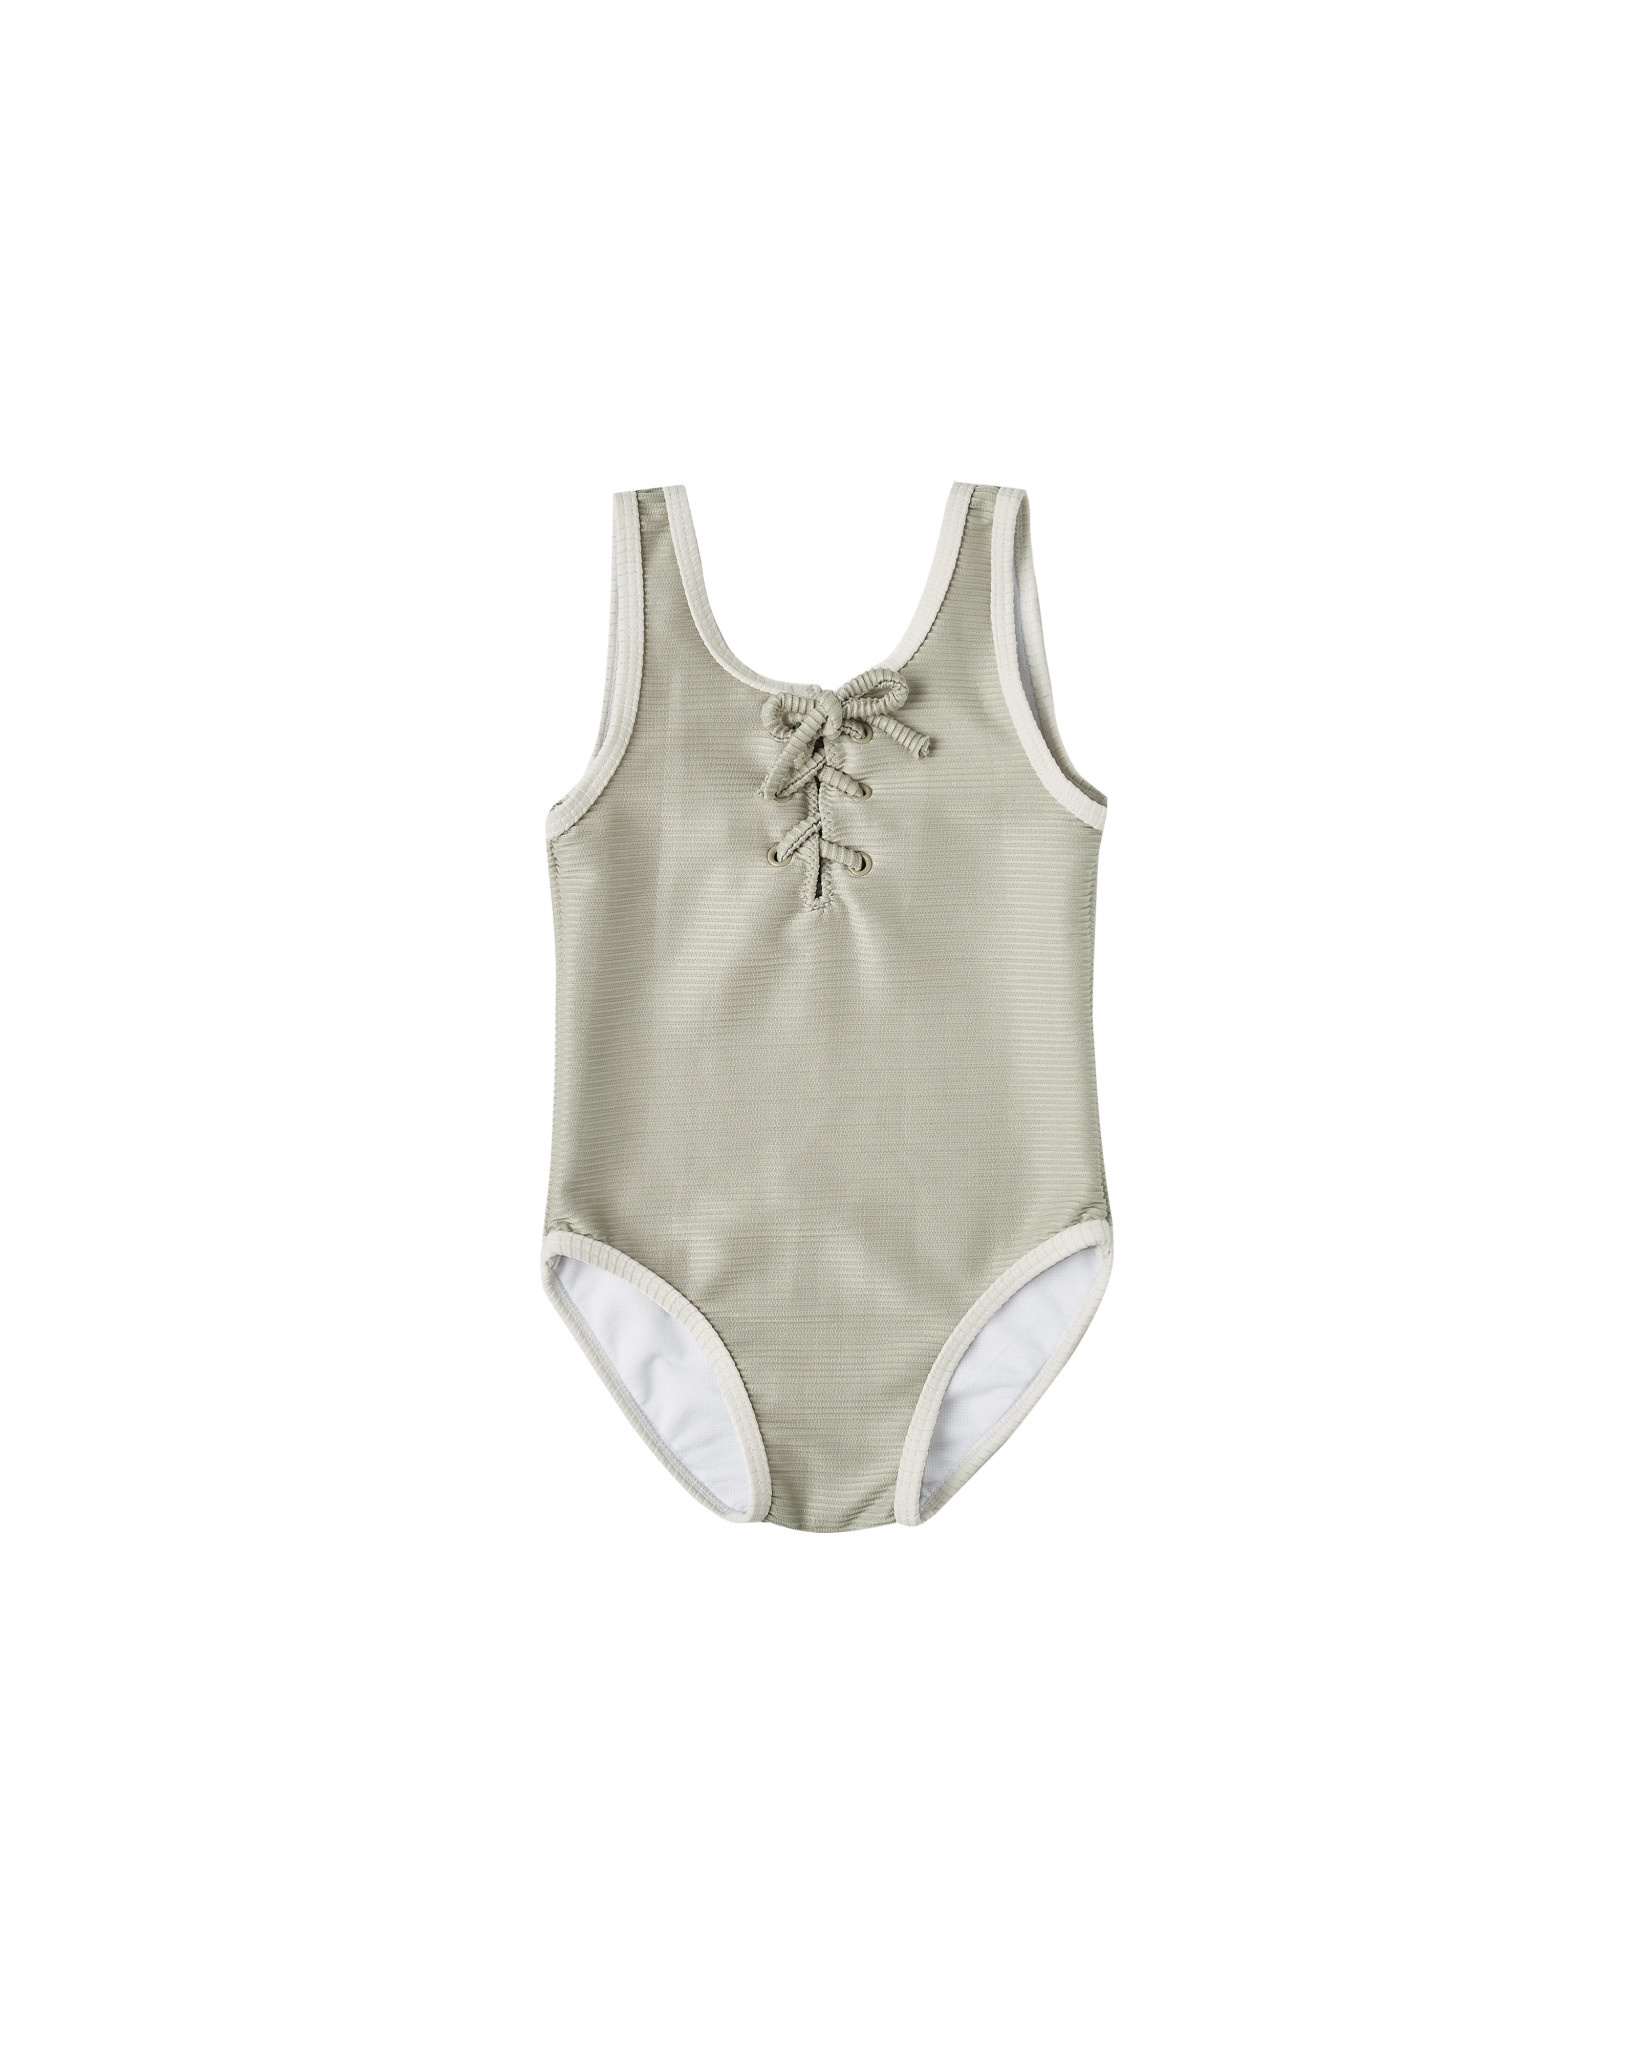 Rylee & Cru Laced Swimsuit - Sage